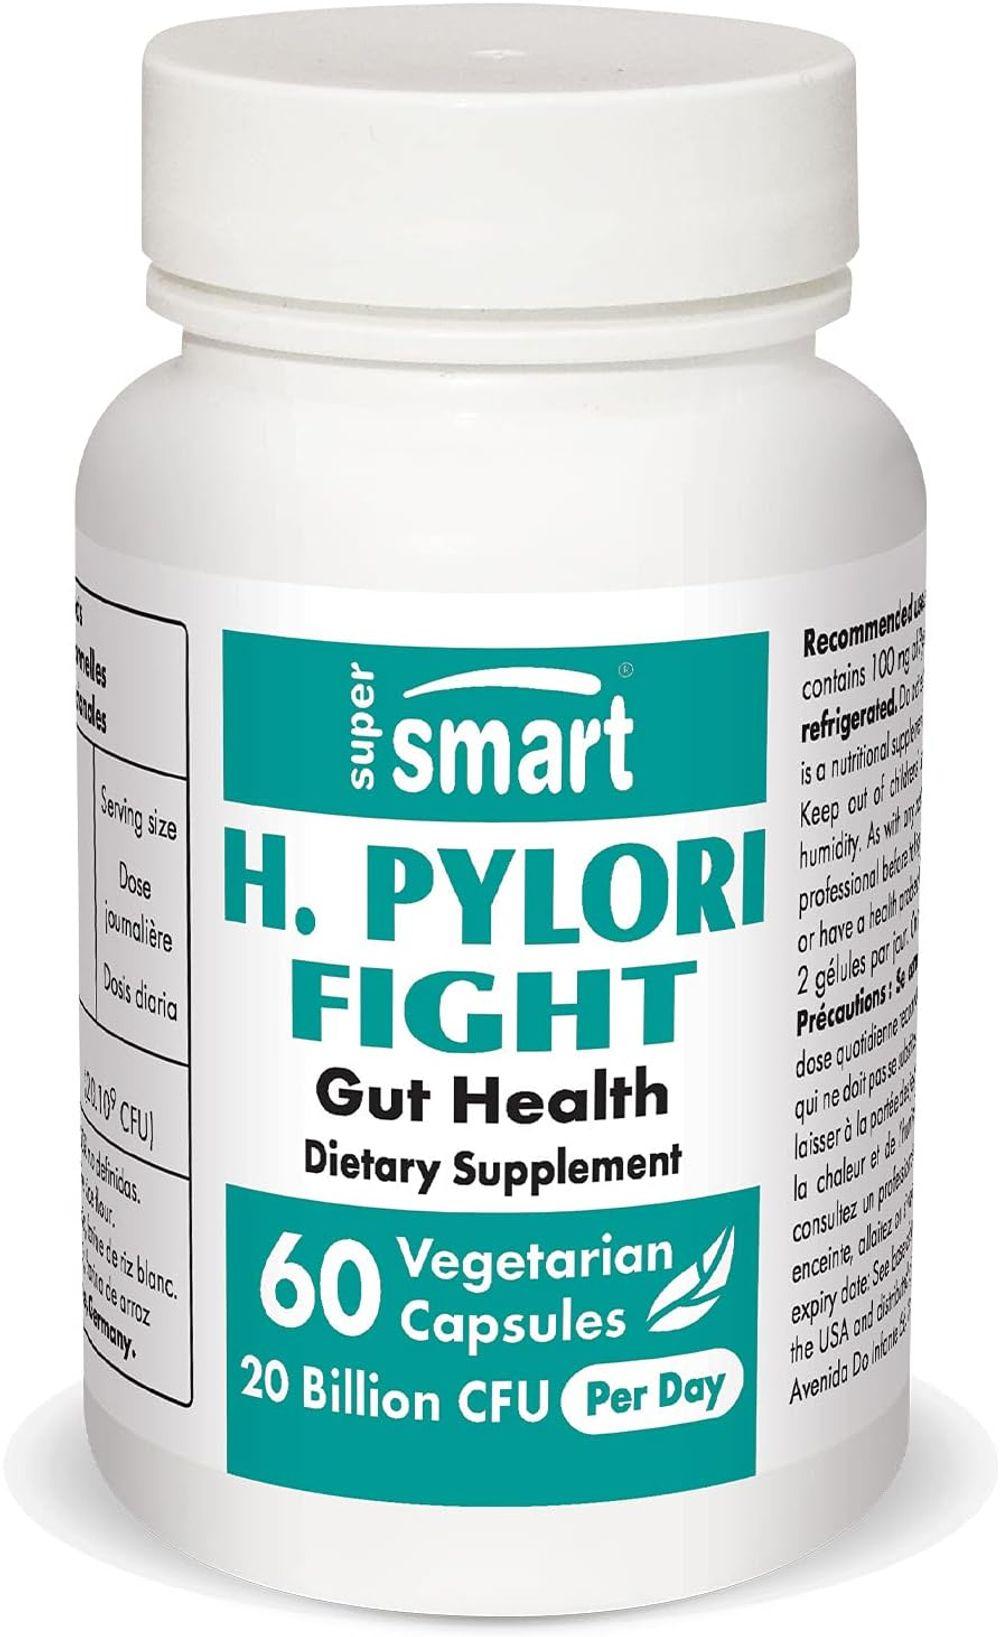 Supersmart - H. Pylori Fight Natural Treatment 20 Billion CFU Per Day - Contains Lactobacillus Reuteri (Probiotic) - Relieves Acid Reflux | Non-GMO & Gluten Free - Made in USA - 60 Vegetarian Capsules